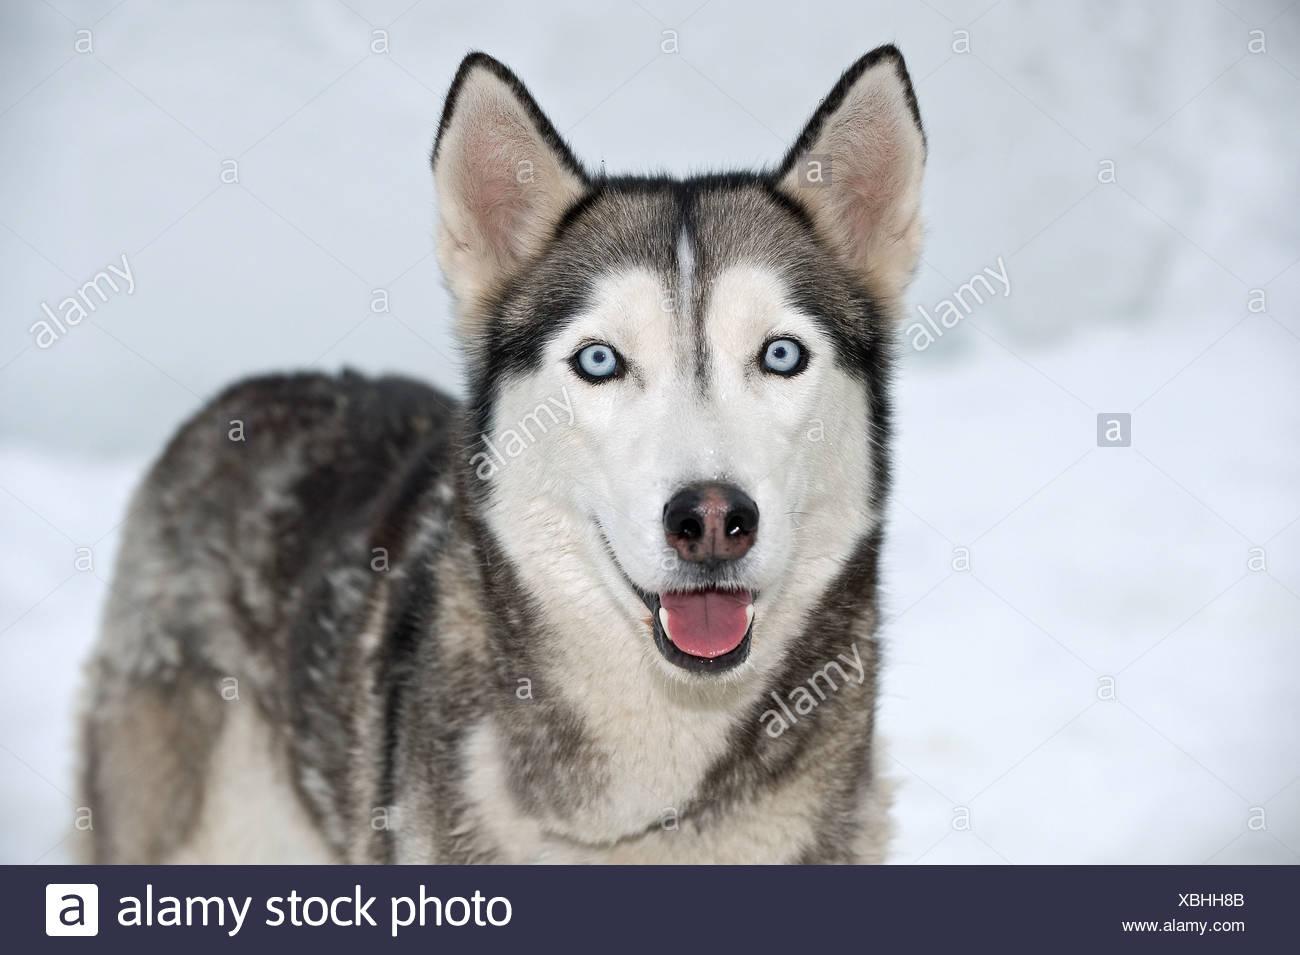 Siberian Husky Dog Standing Snow Stock Photo 282513851 Alamy